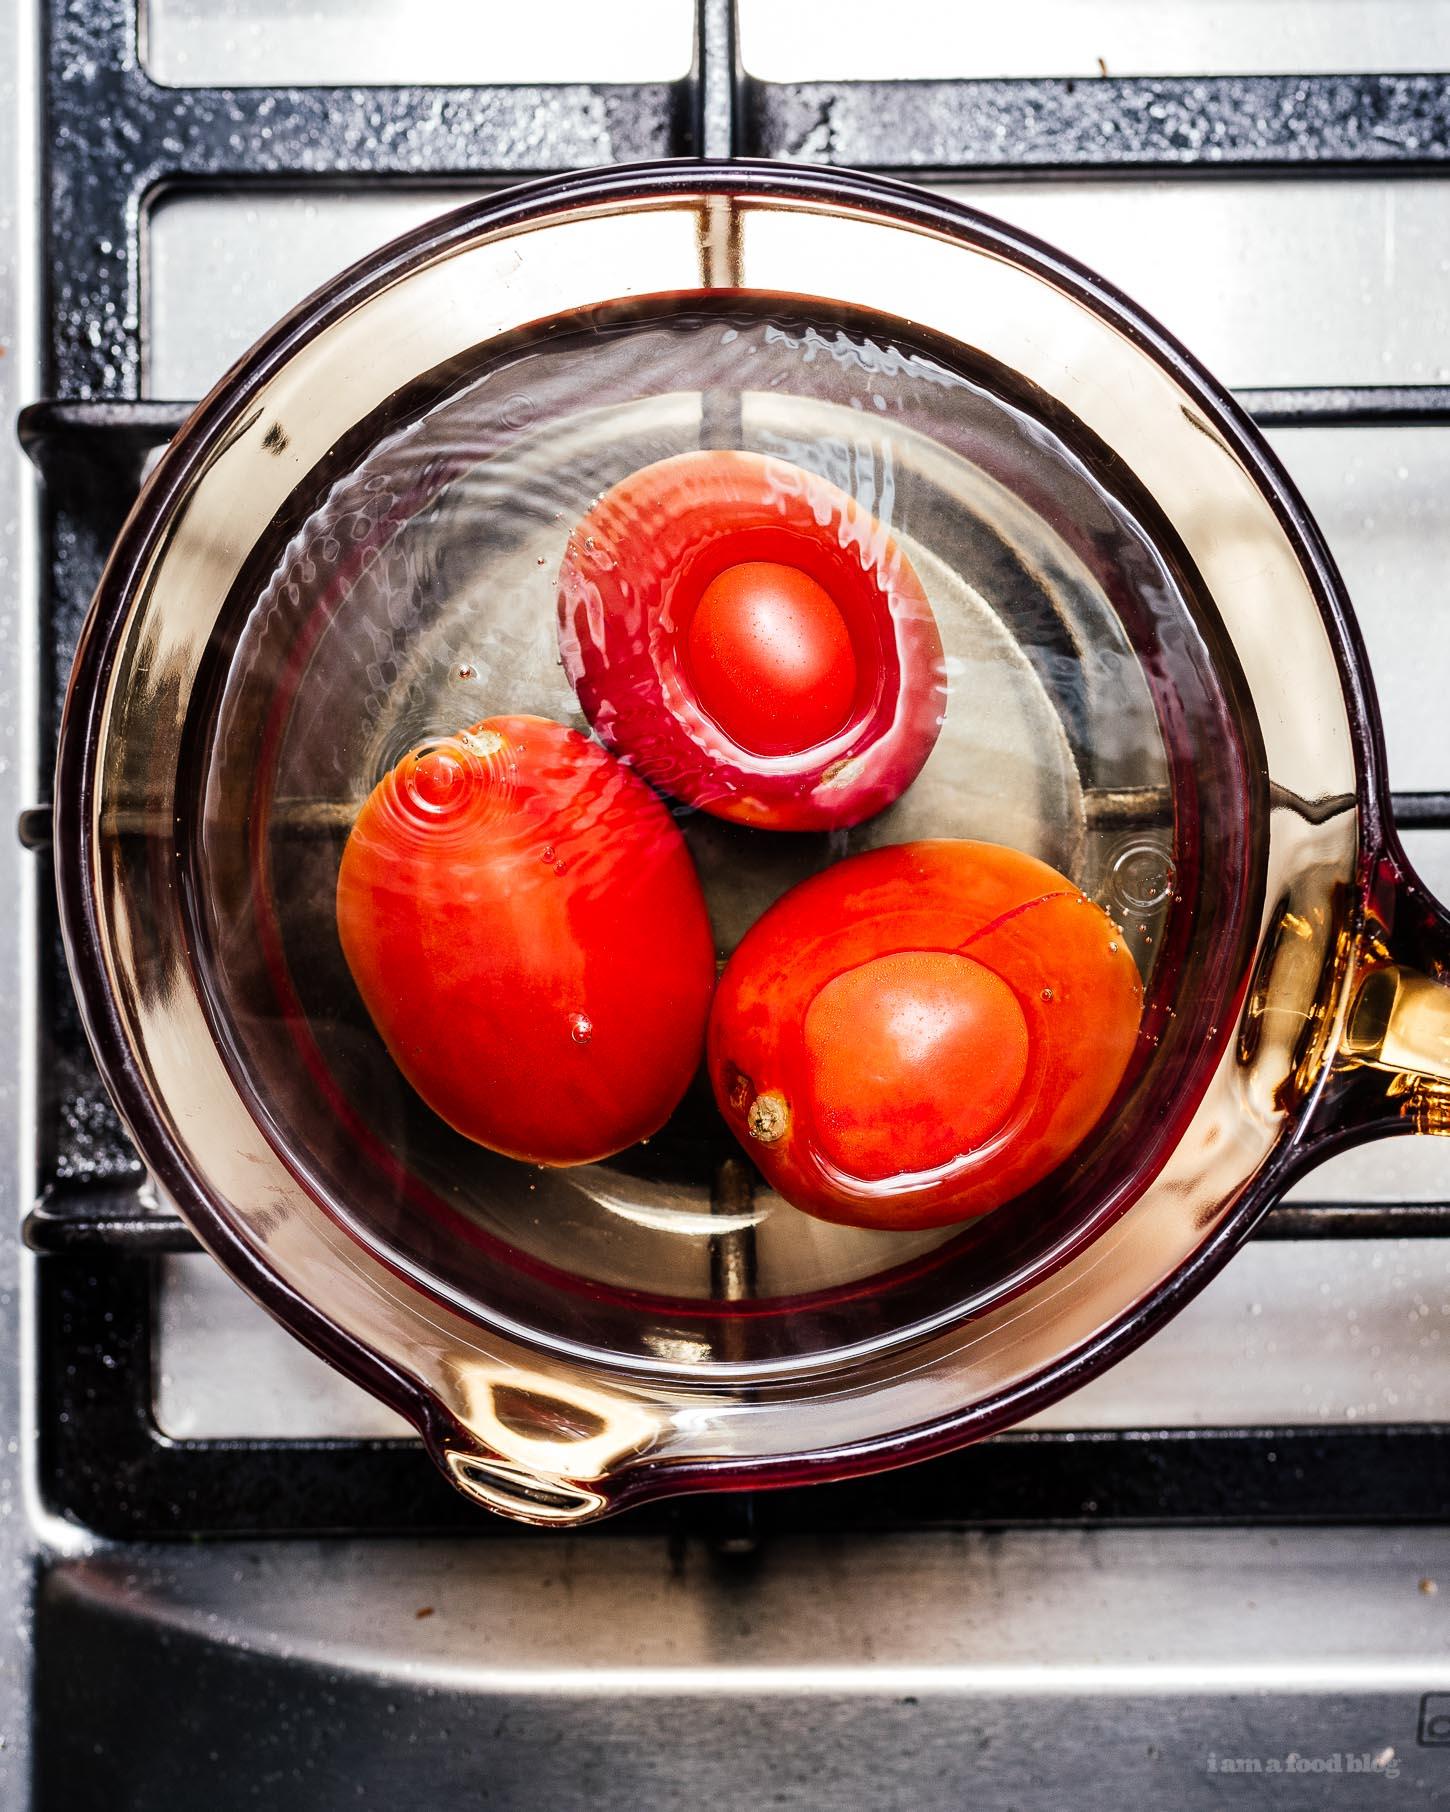 Chinese Tomato Egg Stir Fry | www.iamafoodblog.com